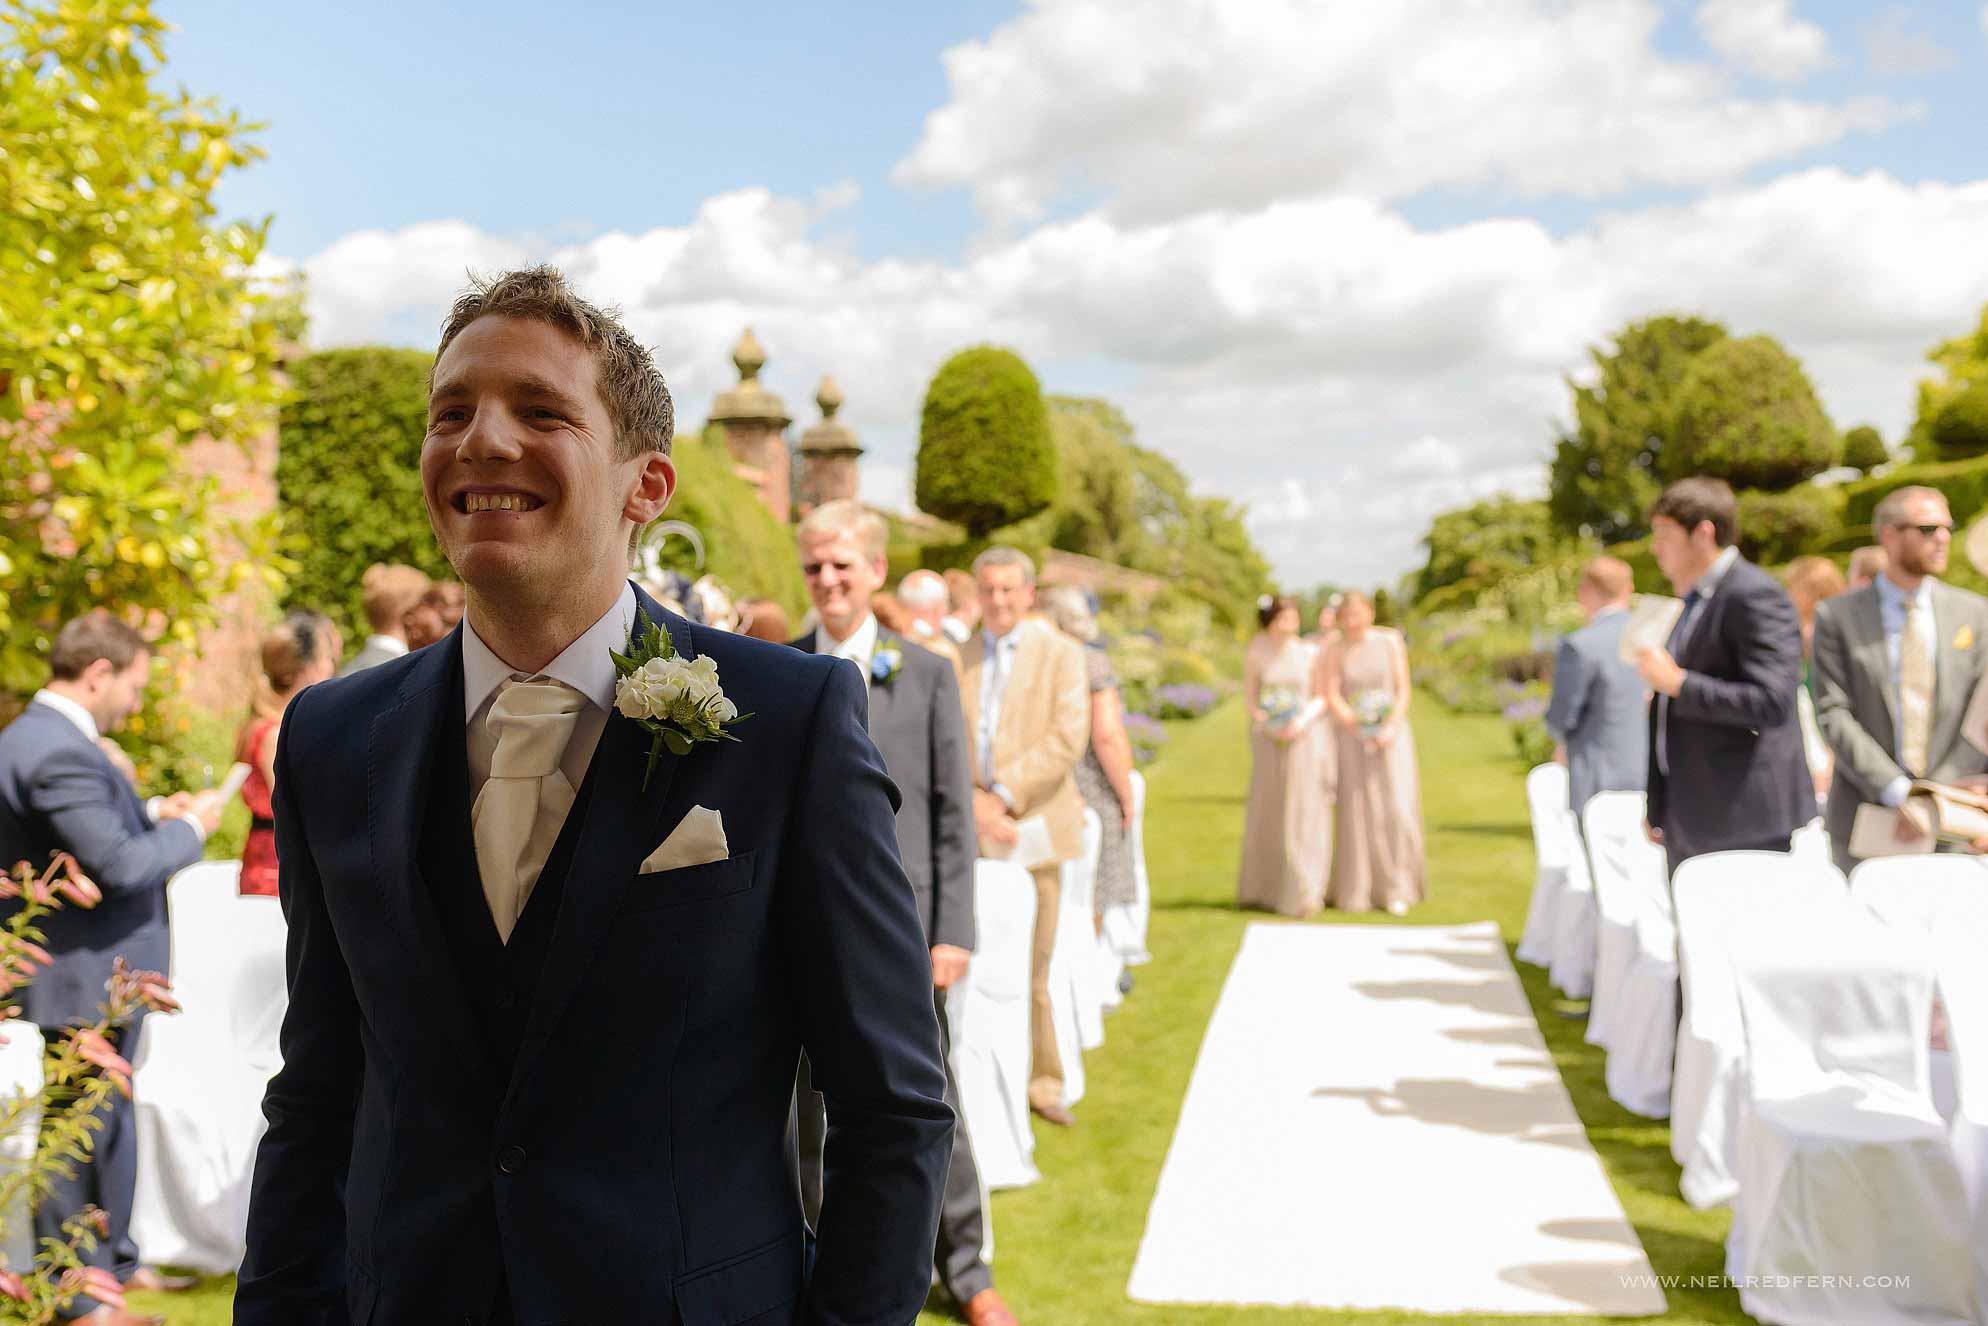 outdoor-wedding-ceremony-in-cheshire-1